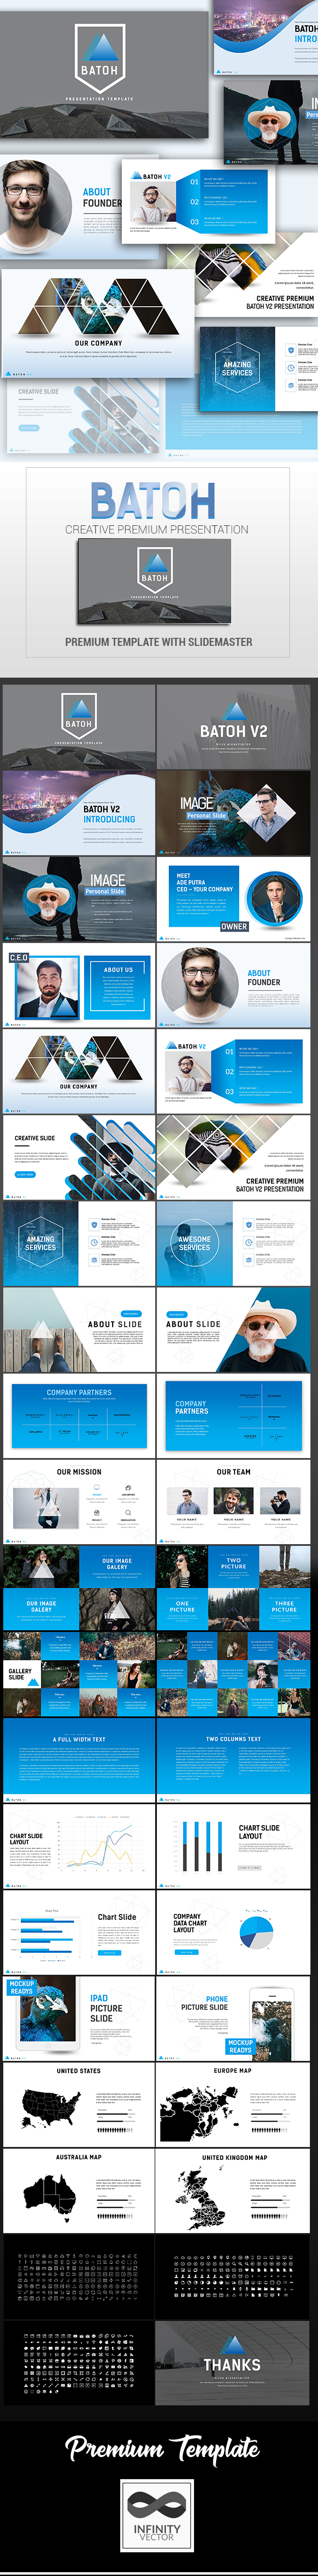 Batoh V2 Creative Presentation Google Slide - Google Slides Presentation Templates